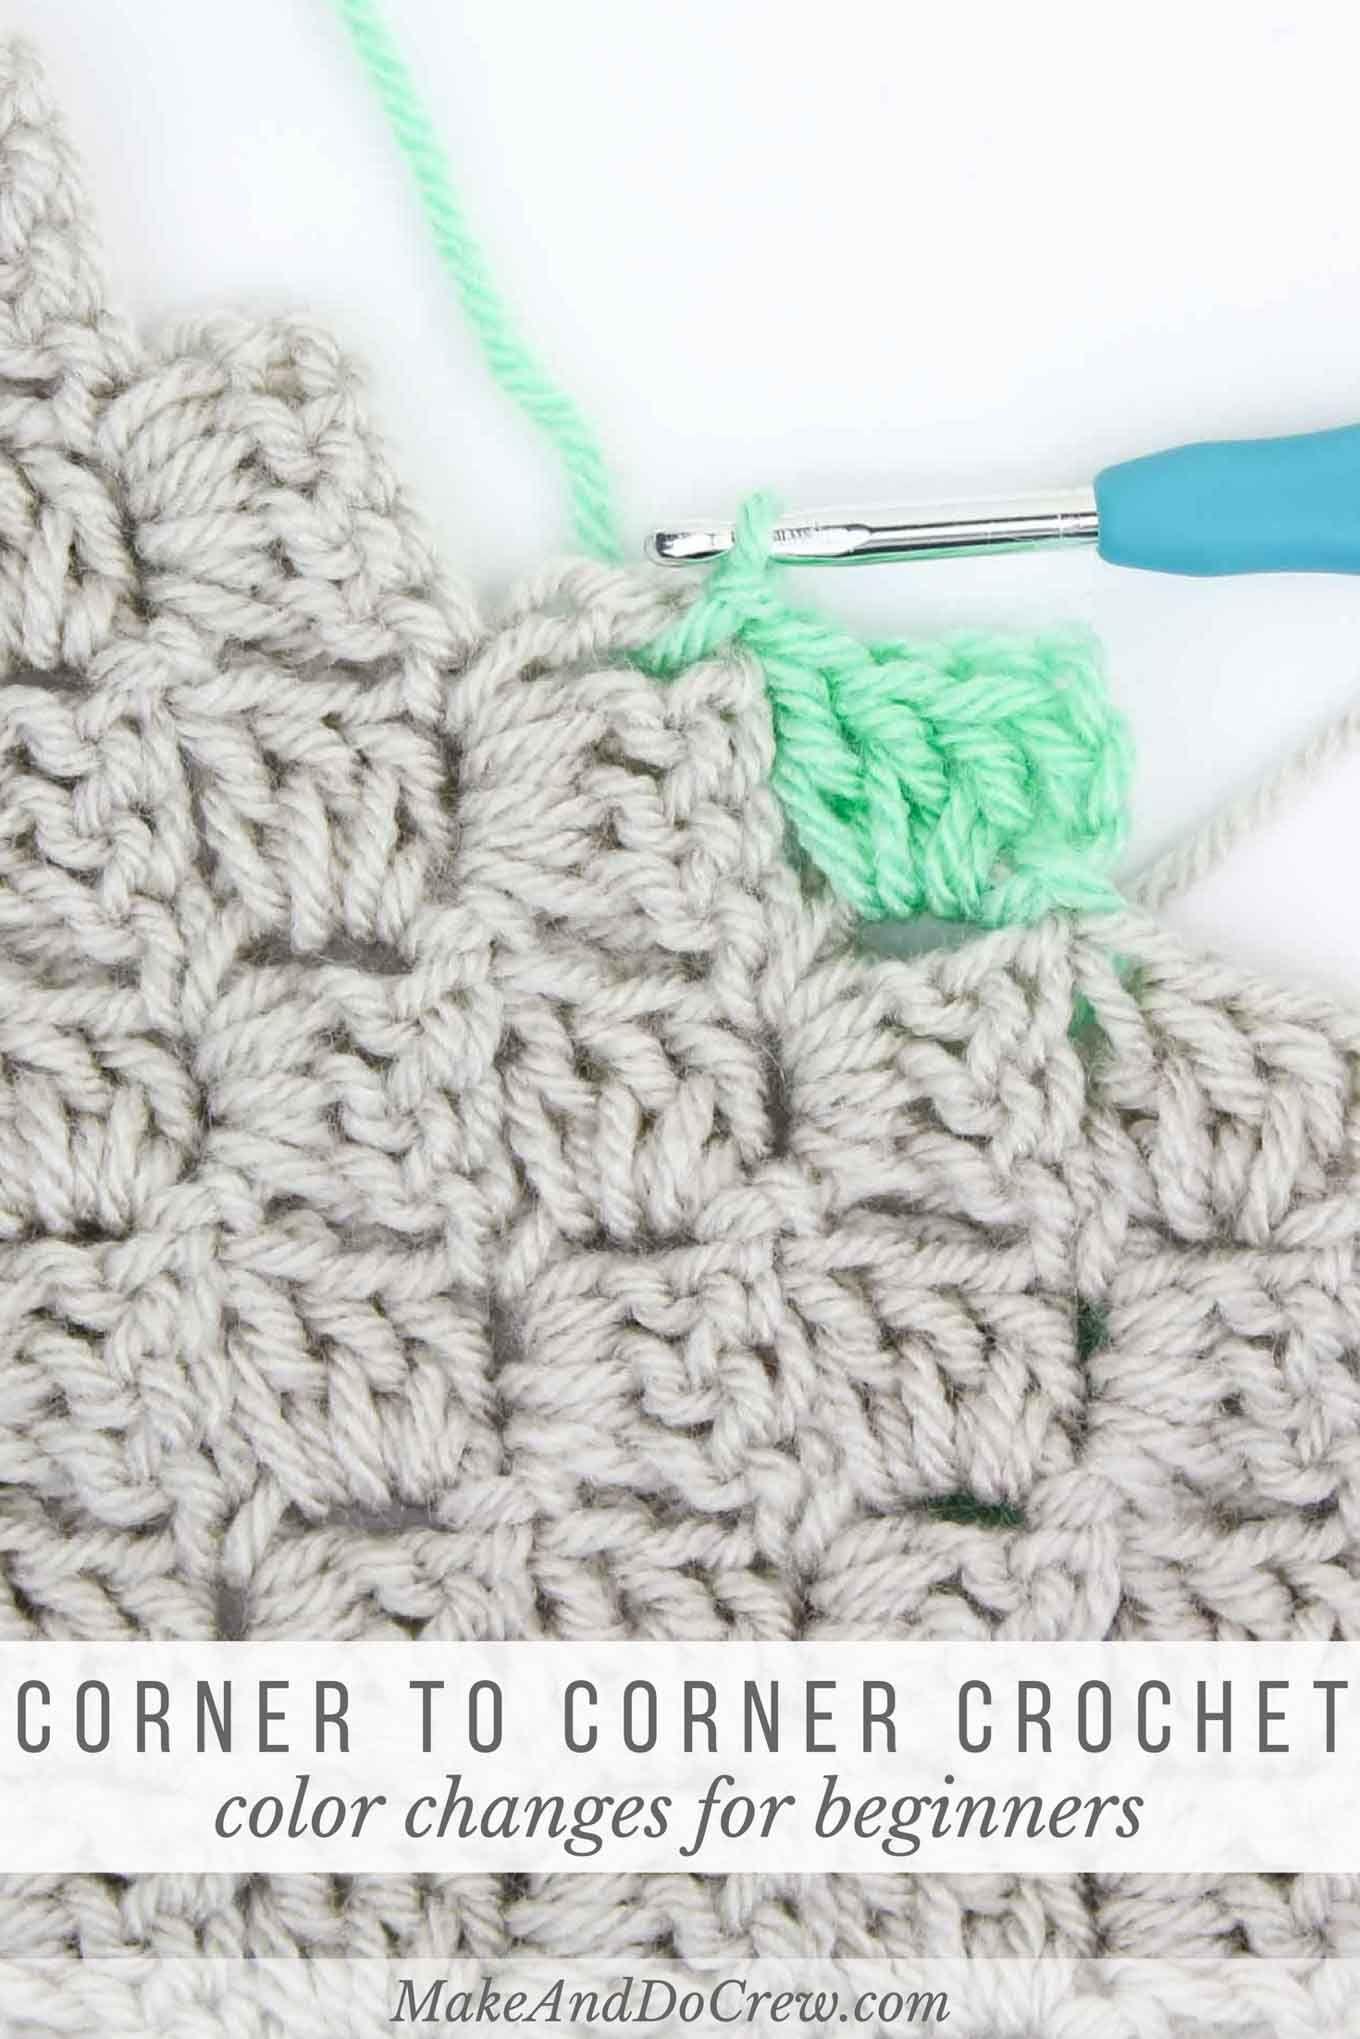 How to Change Colors in Corner to Corner Crochet | Nuevas y Tejido